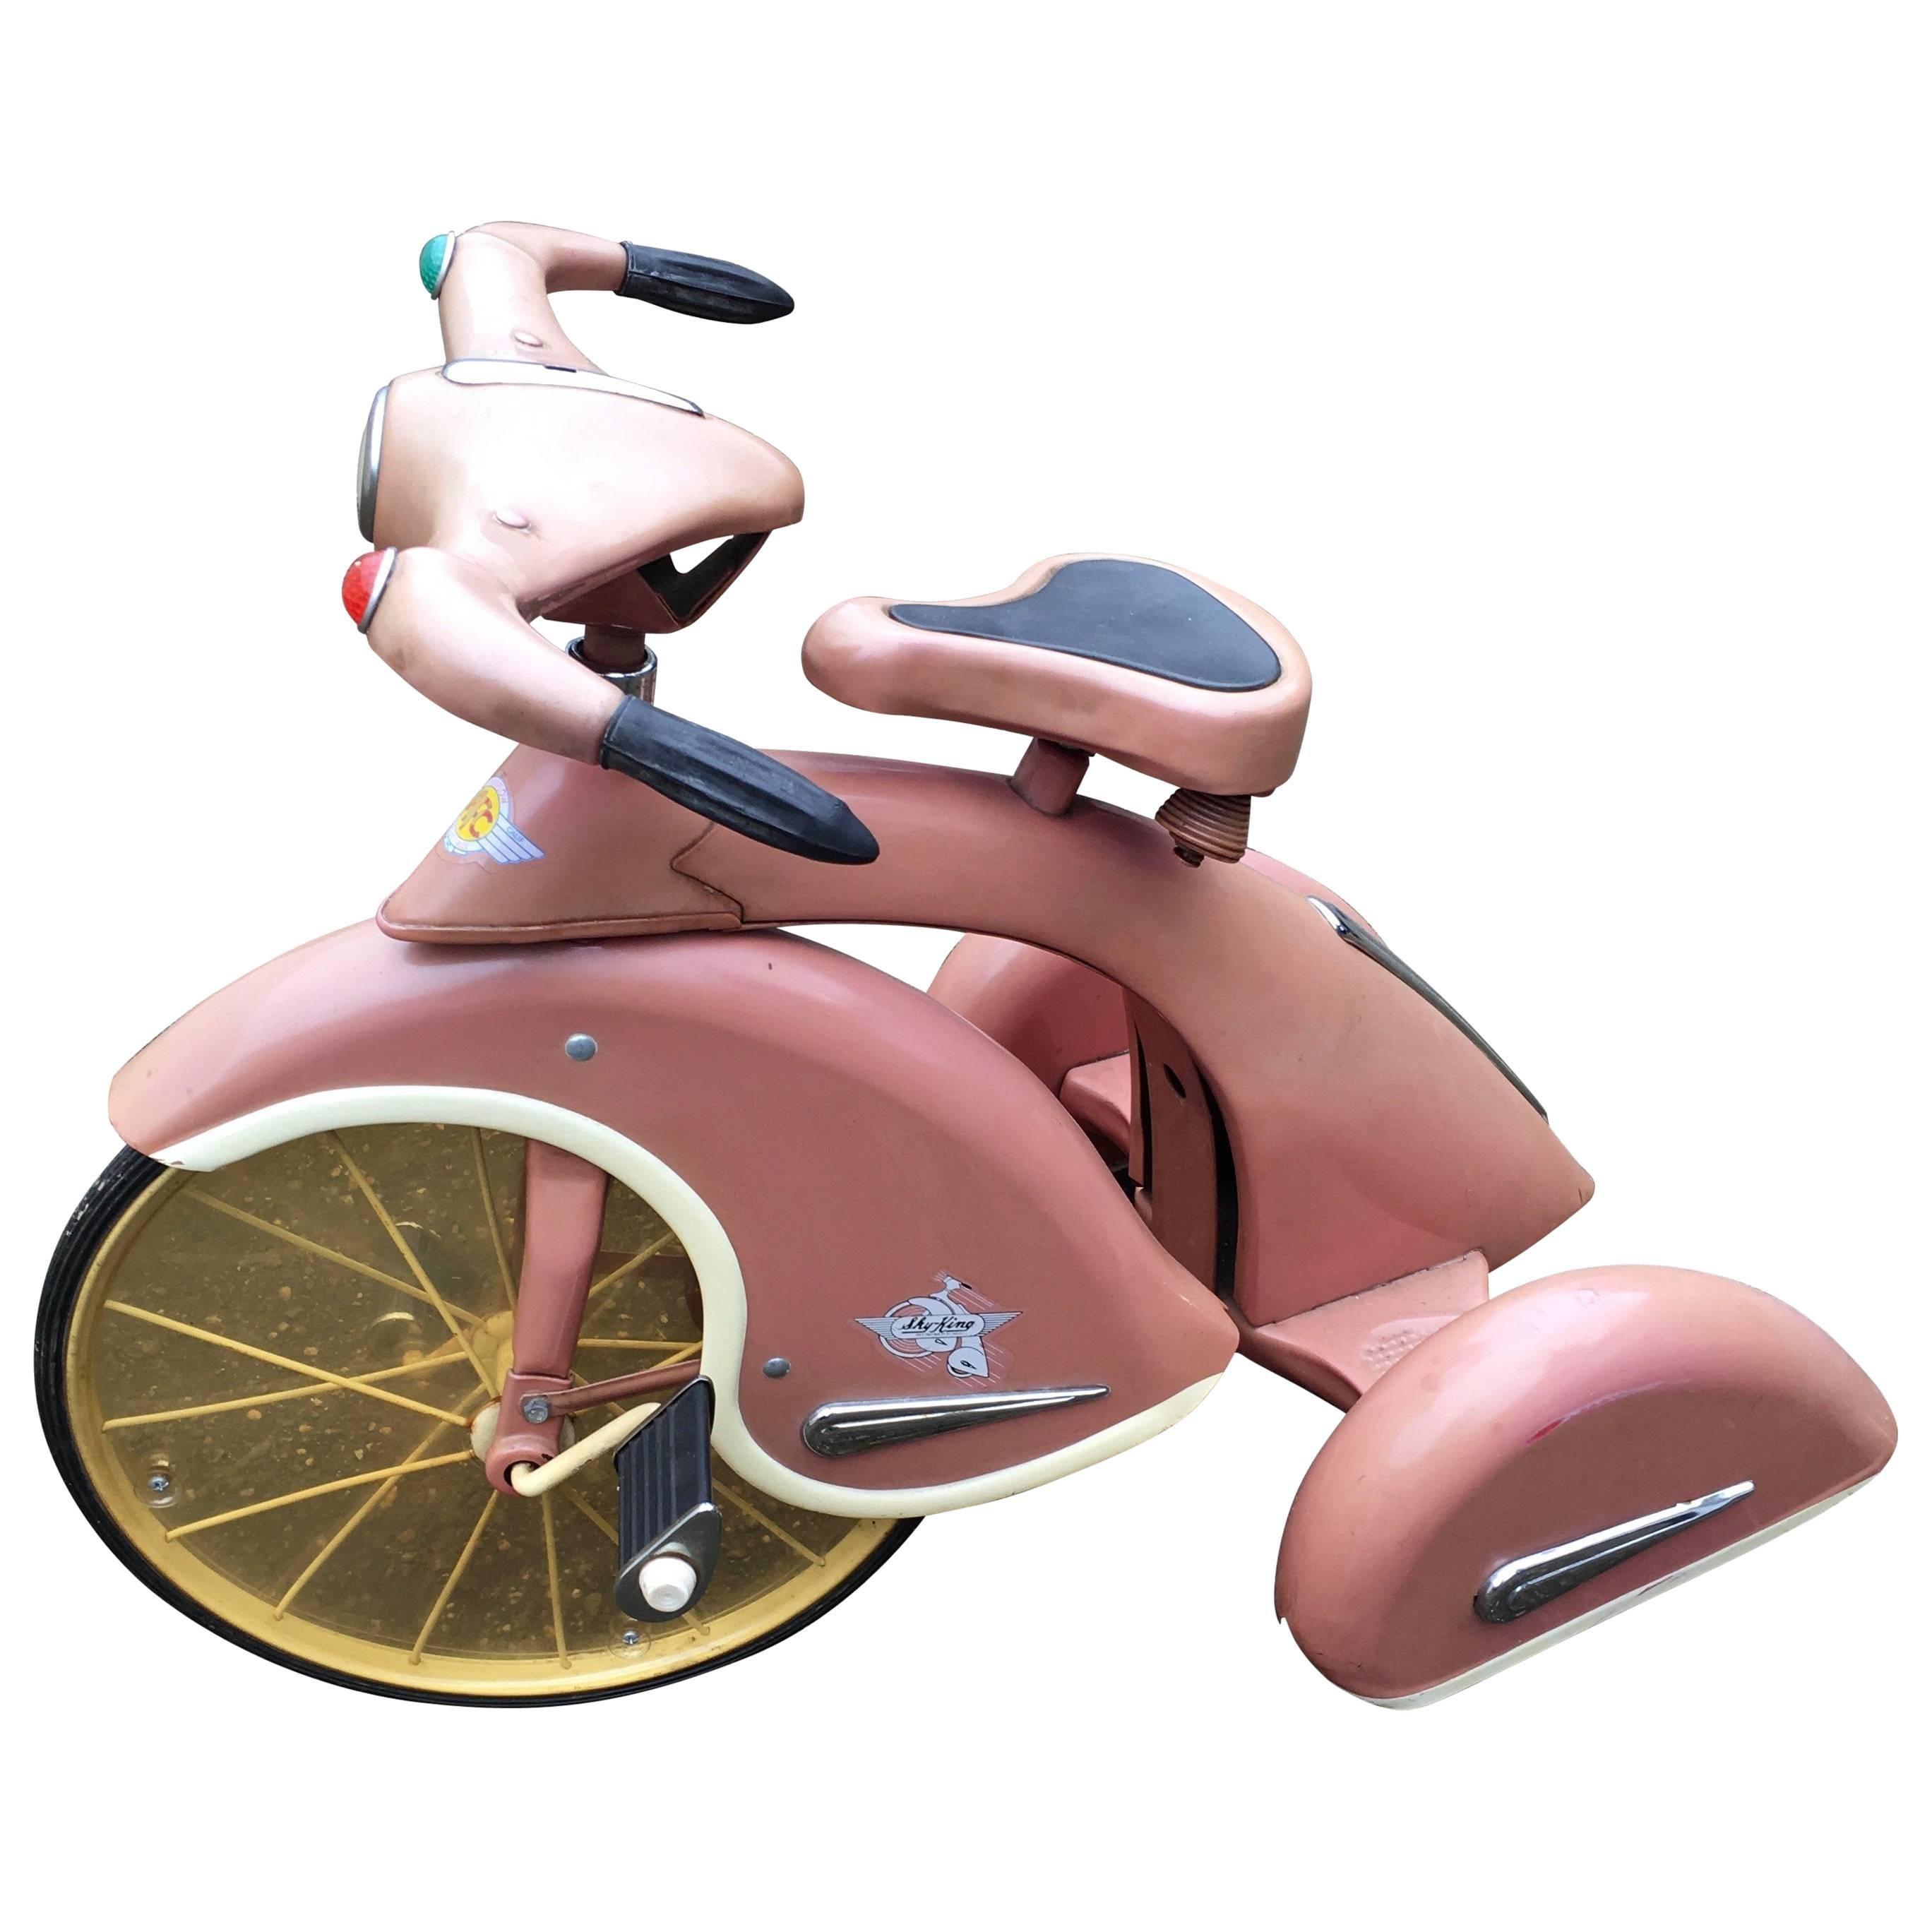 "Kids Tricycle Bike Model ""Sky King"", 1930s"